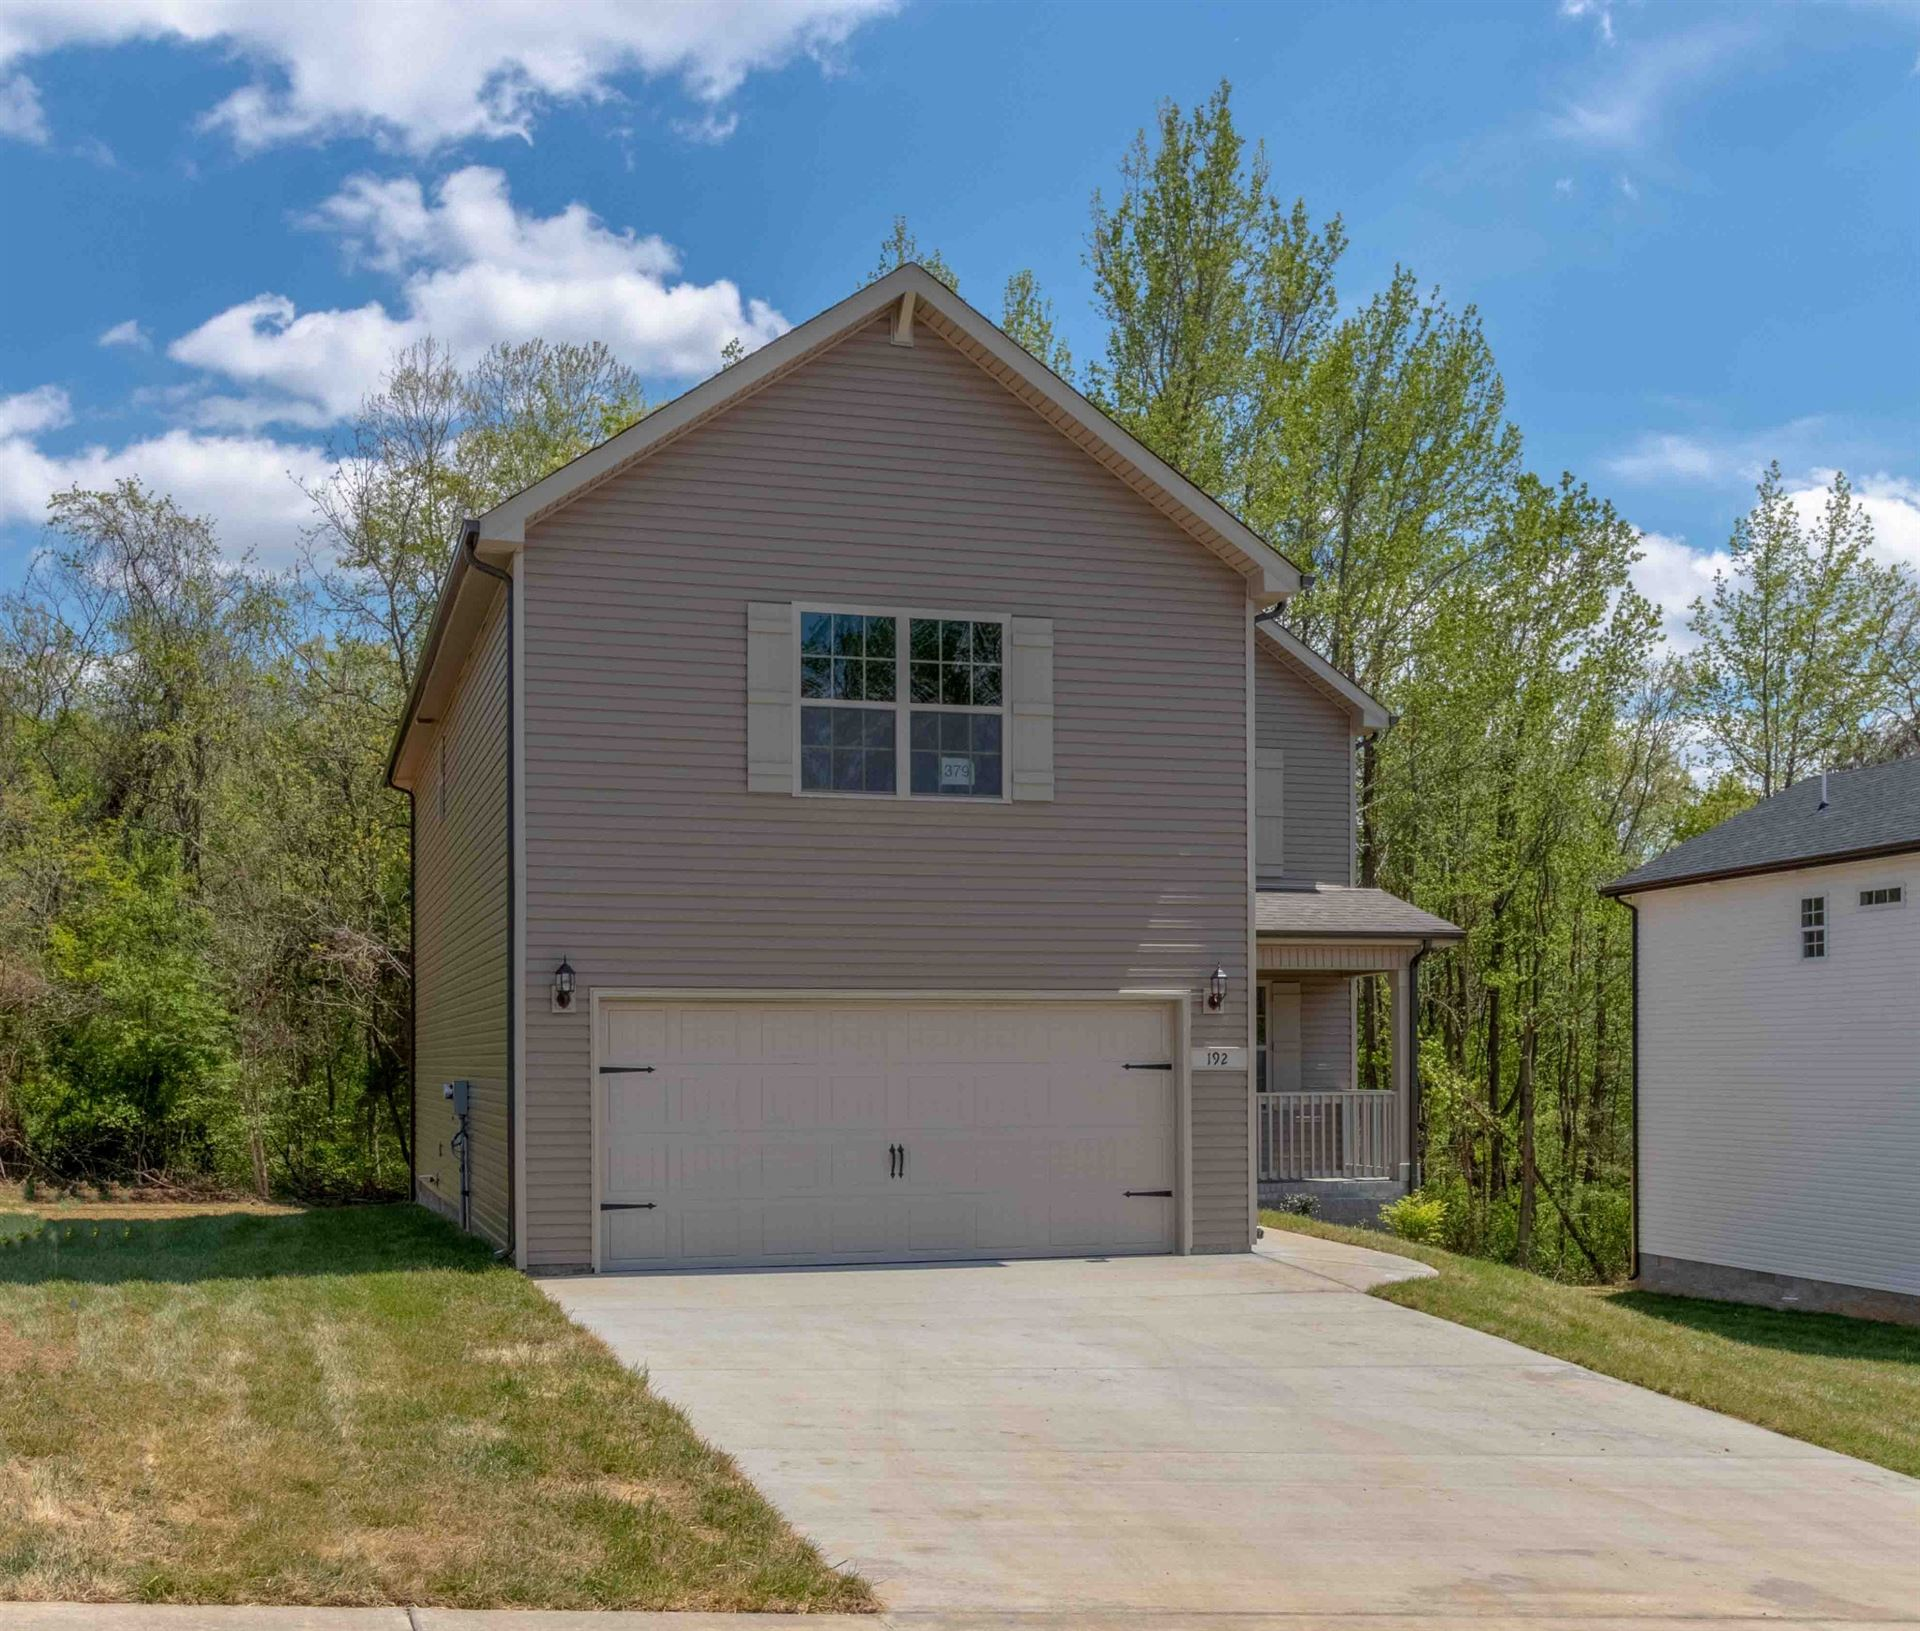 192 Bonnell Drive, Clarksville, TN 37042 - MLS#: 2230291